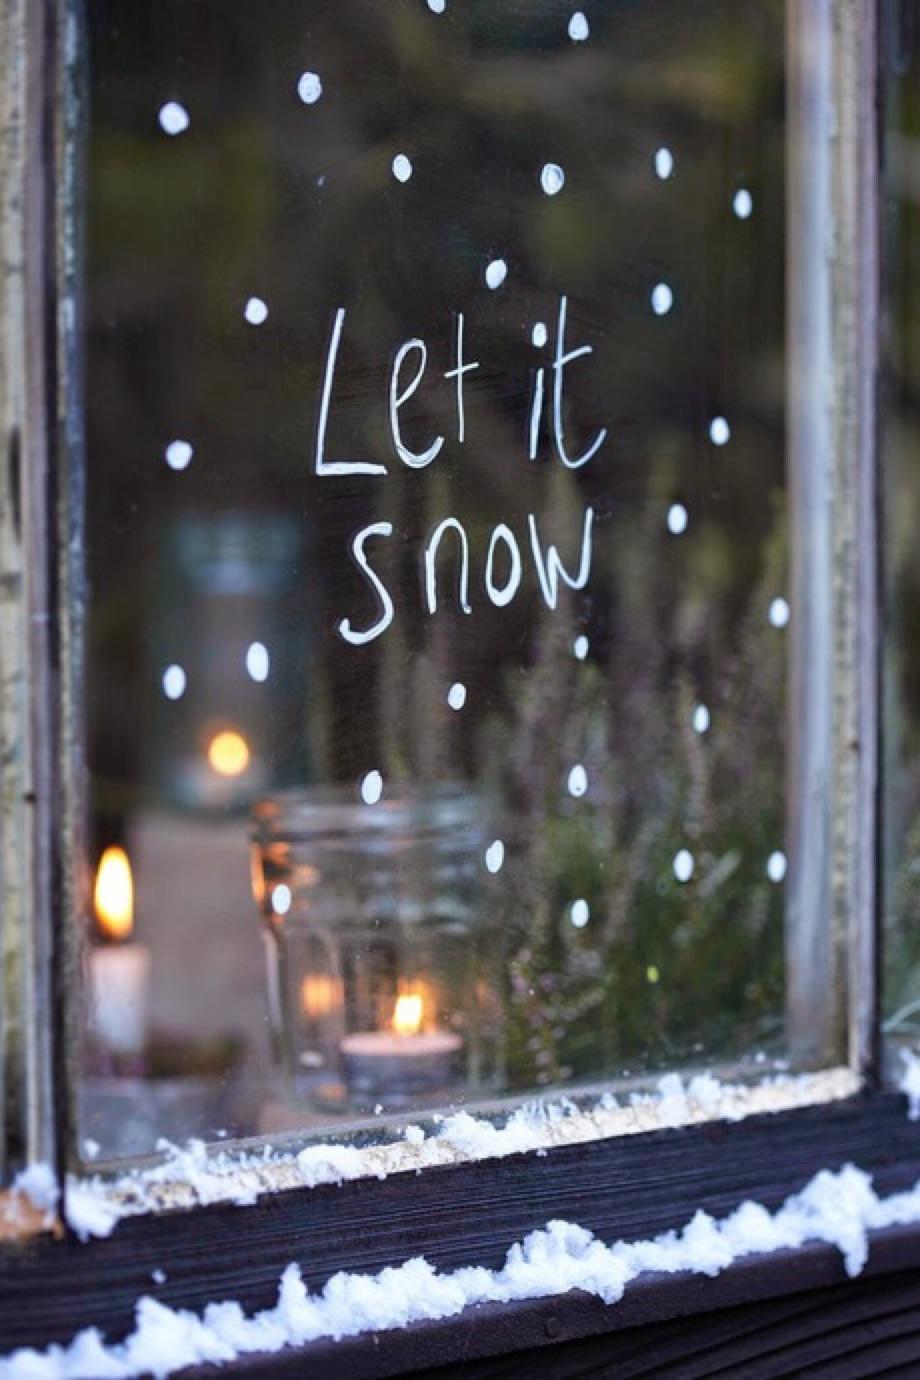 letitsnow window christmas